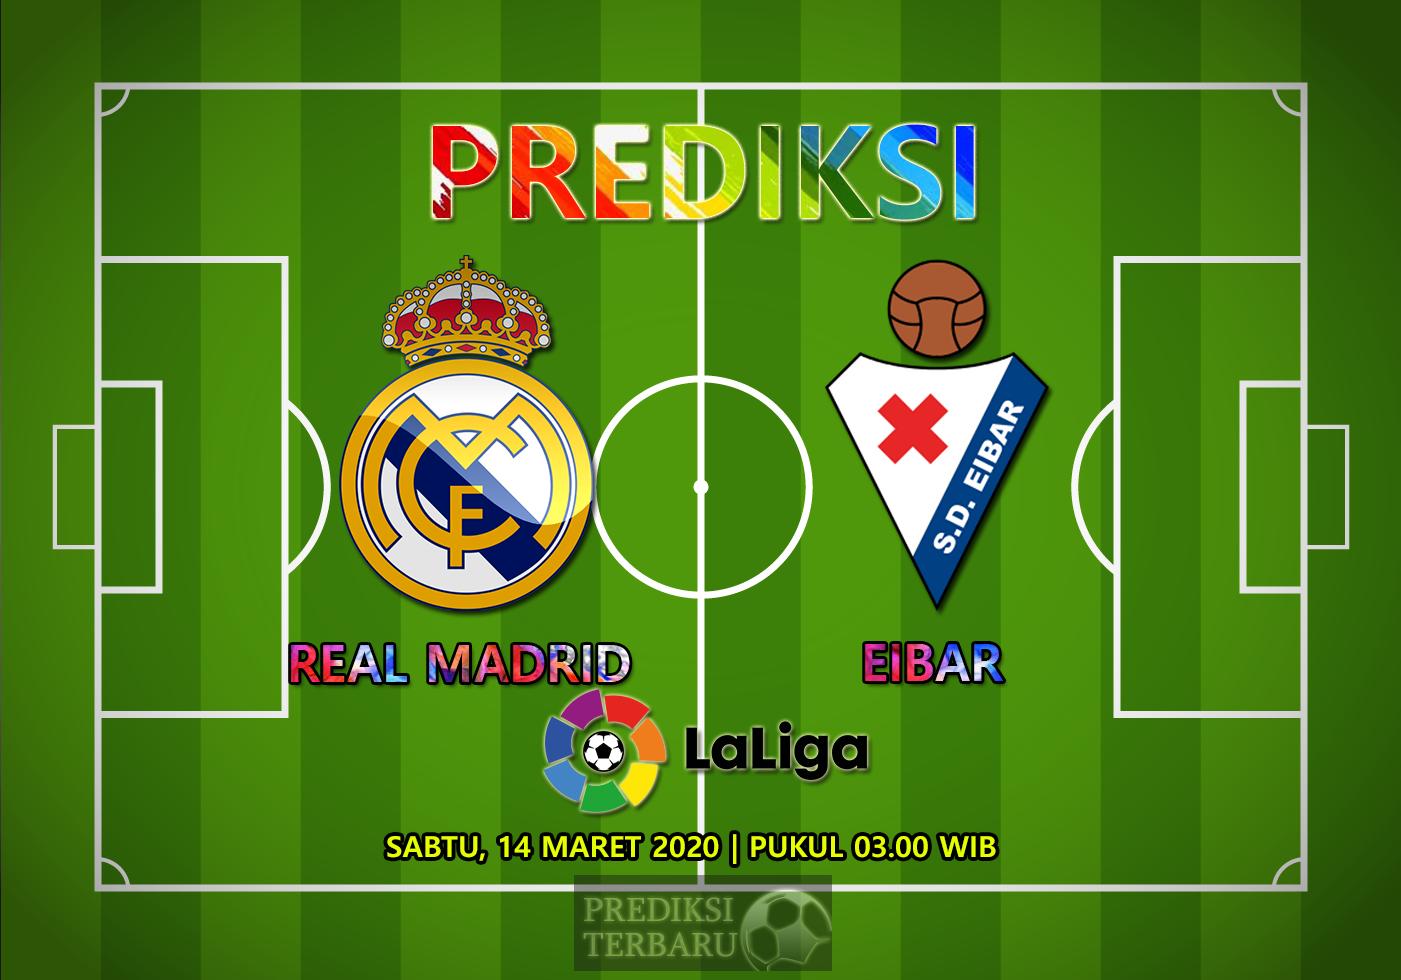 Prediksi Real Madrid Vs Eibar Sabtu 14 Maret